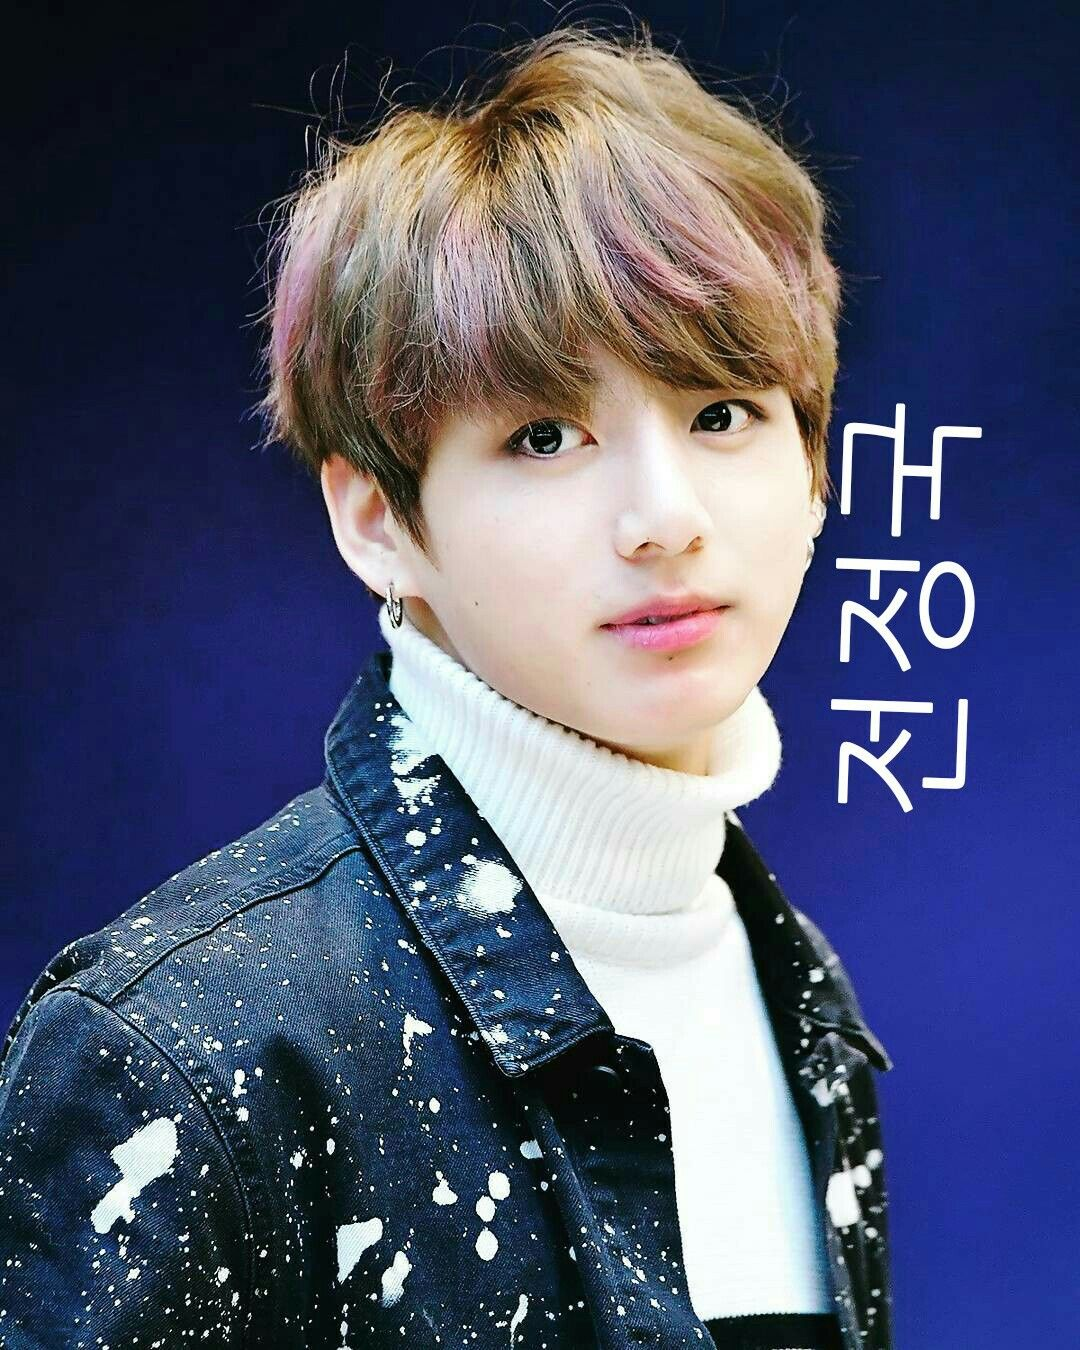 You Look Like A Baby Jungkook. So Cute